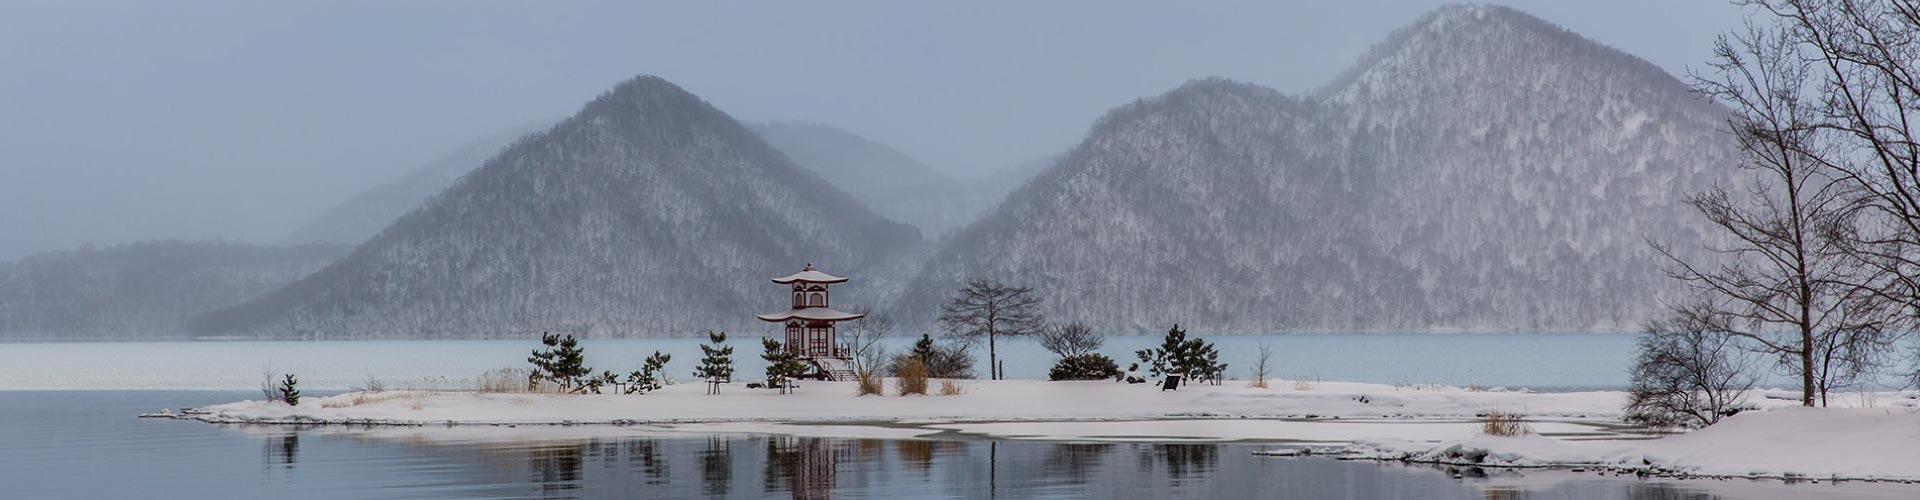 Classic Of Hokkaido